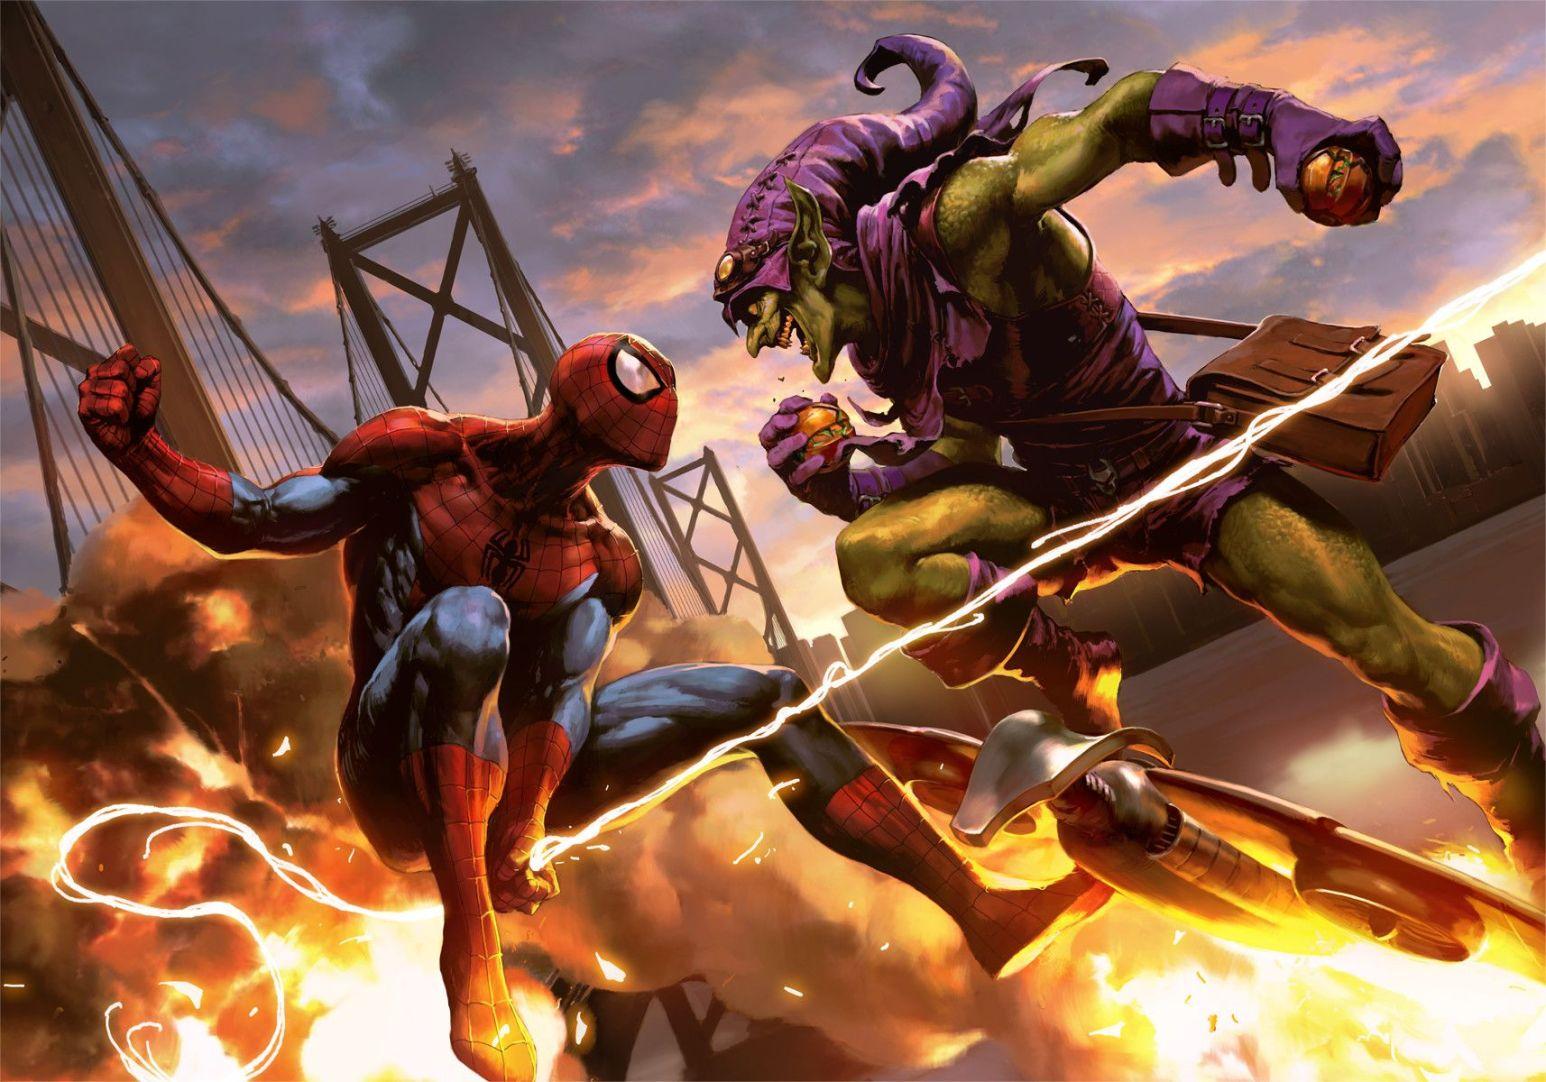 Spider-man vs The Green Goblin